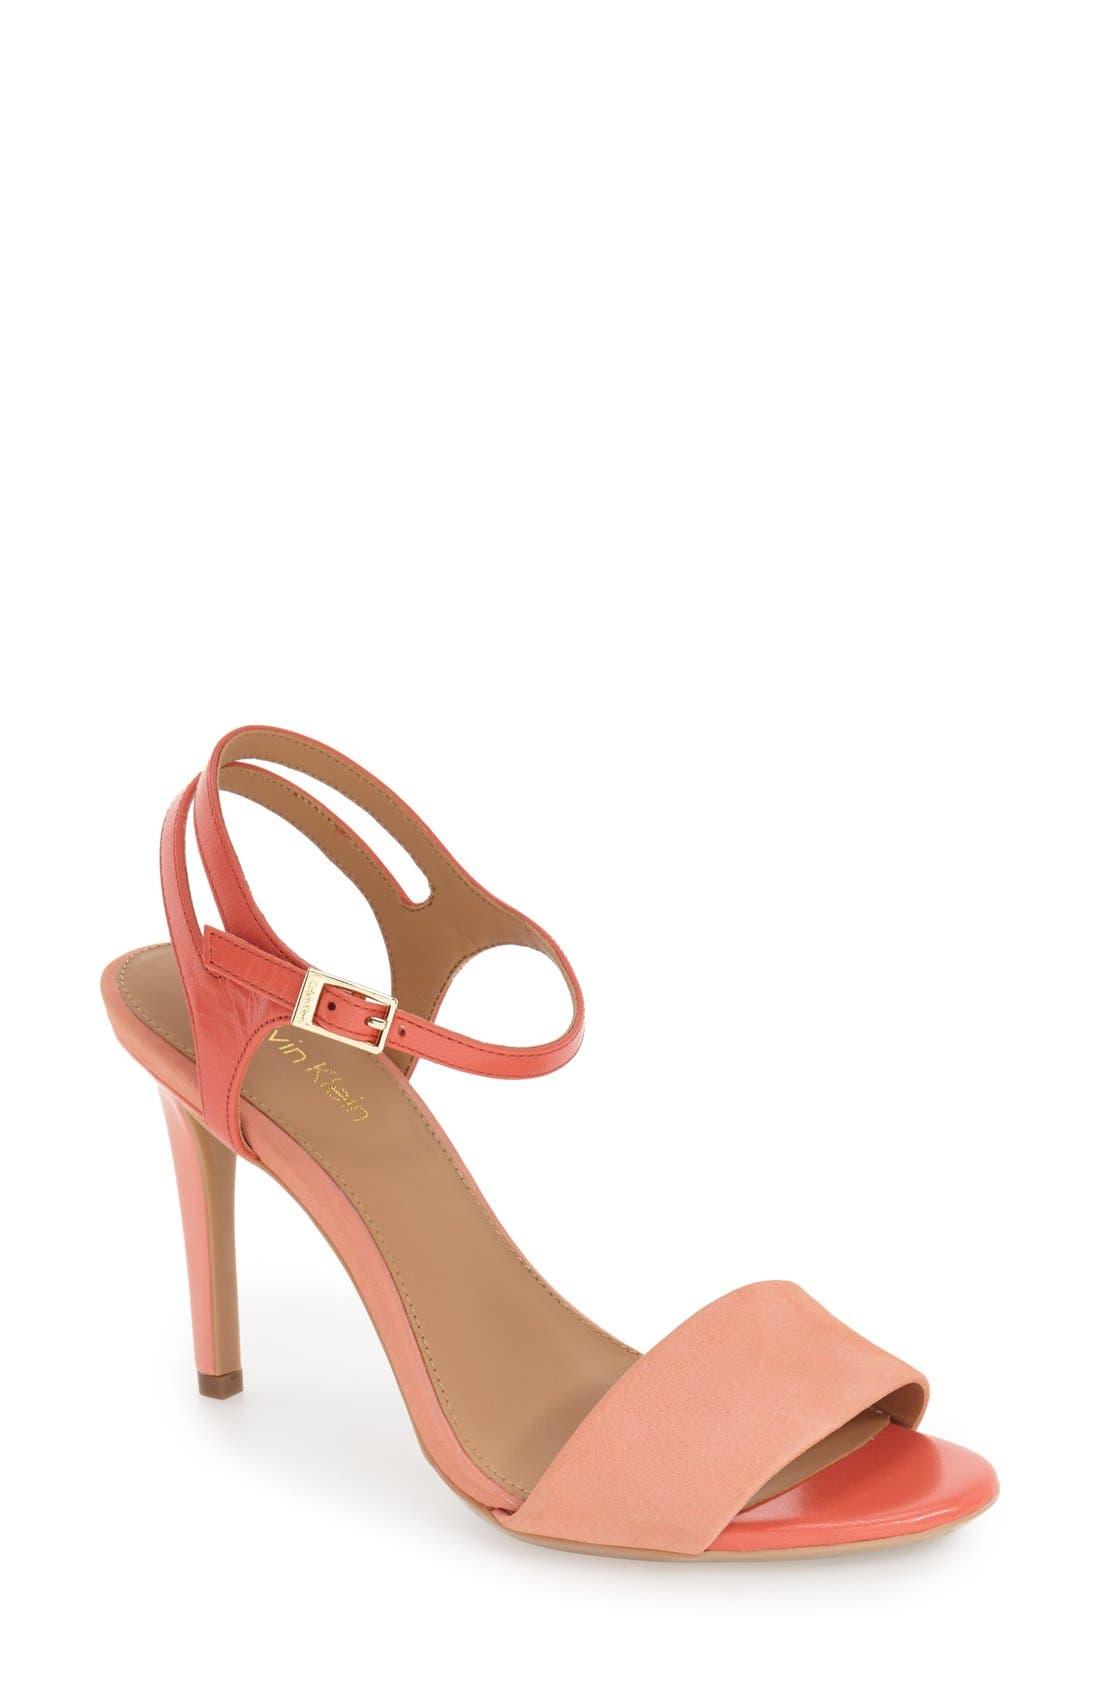 'Nadina' Ankle Strap Sandal,                         Main,                         color, Salmon/ Deep Coral Leather